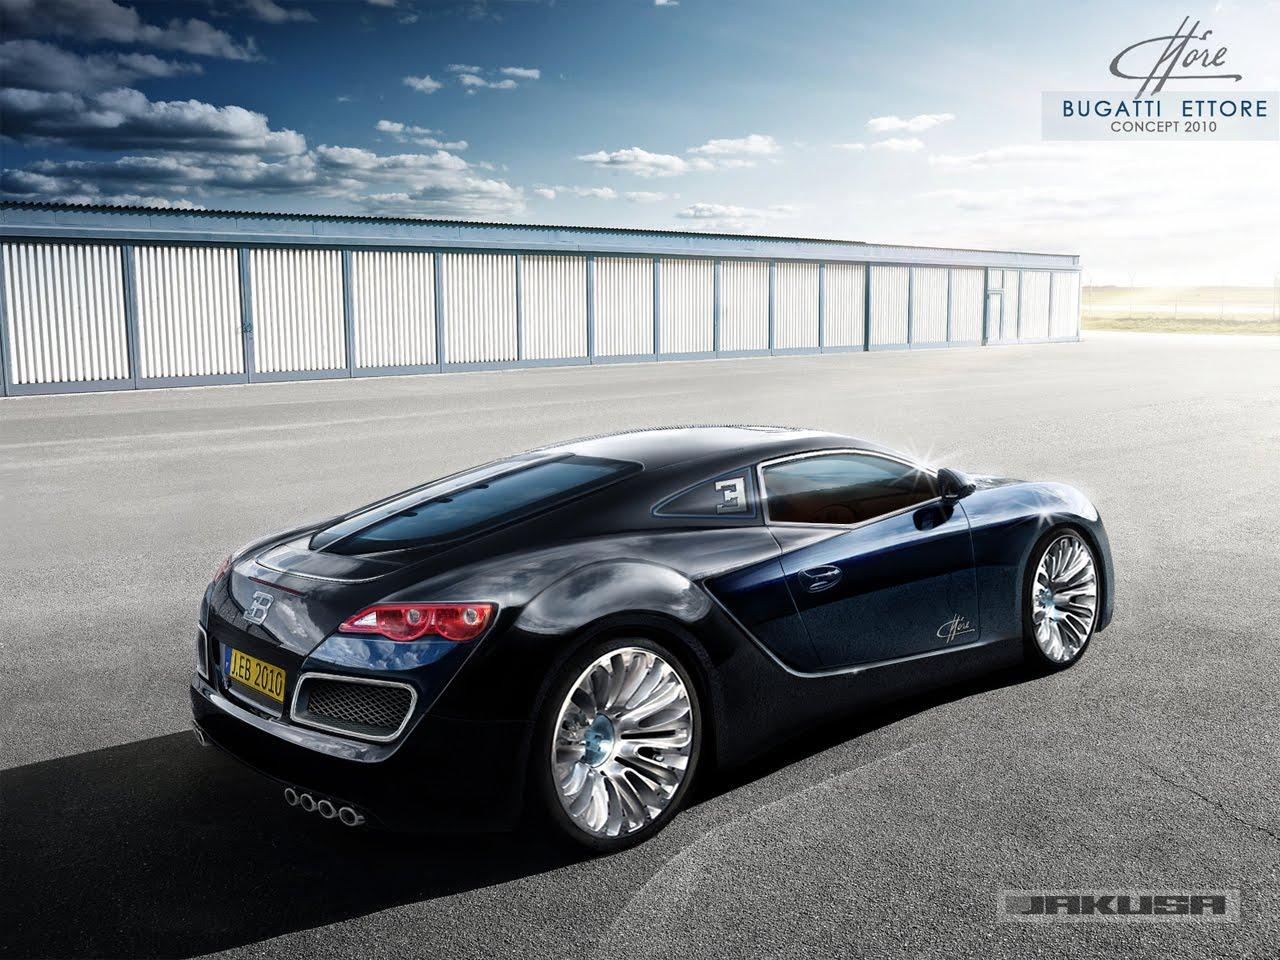 Cars Hd Wallpapers Bugatti Ettore Best Hd Picture